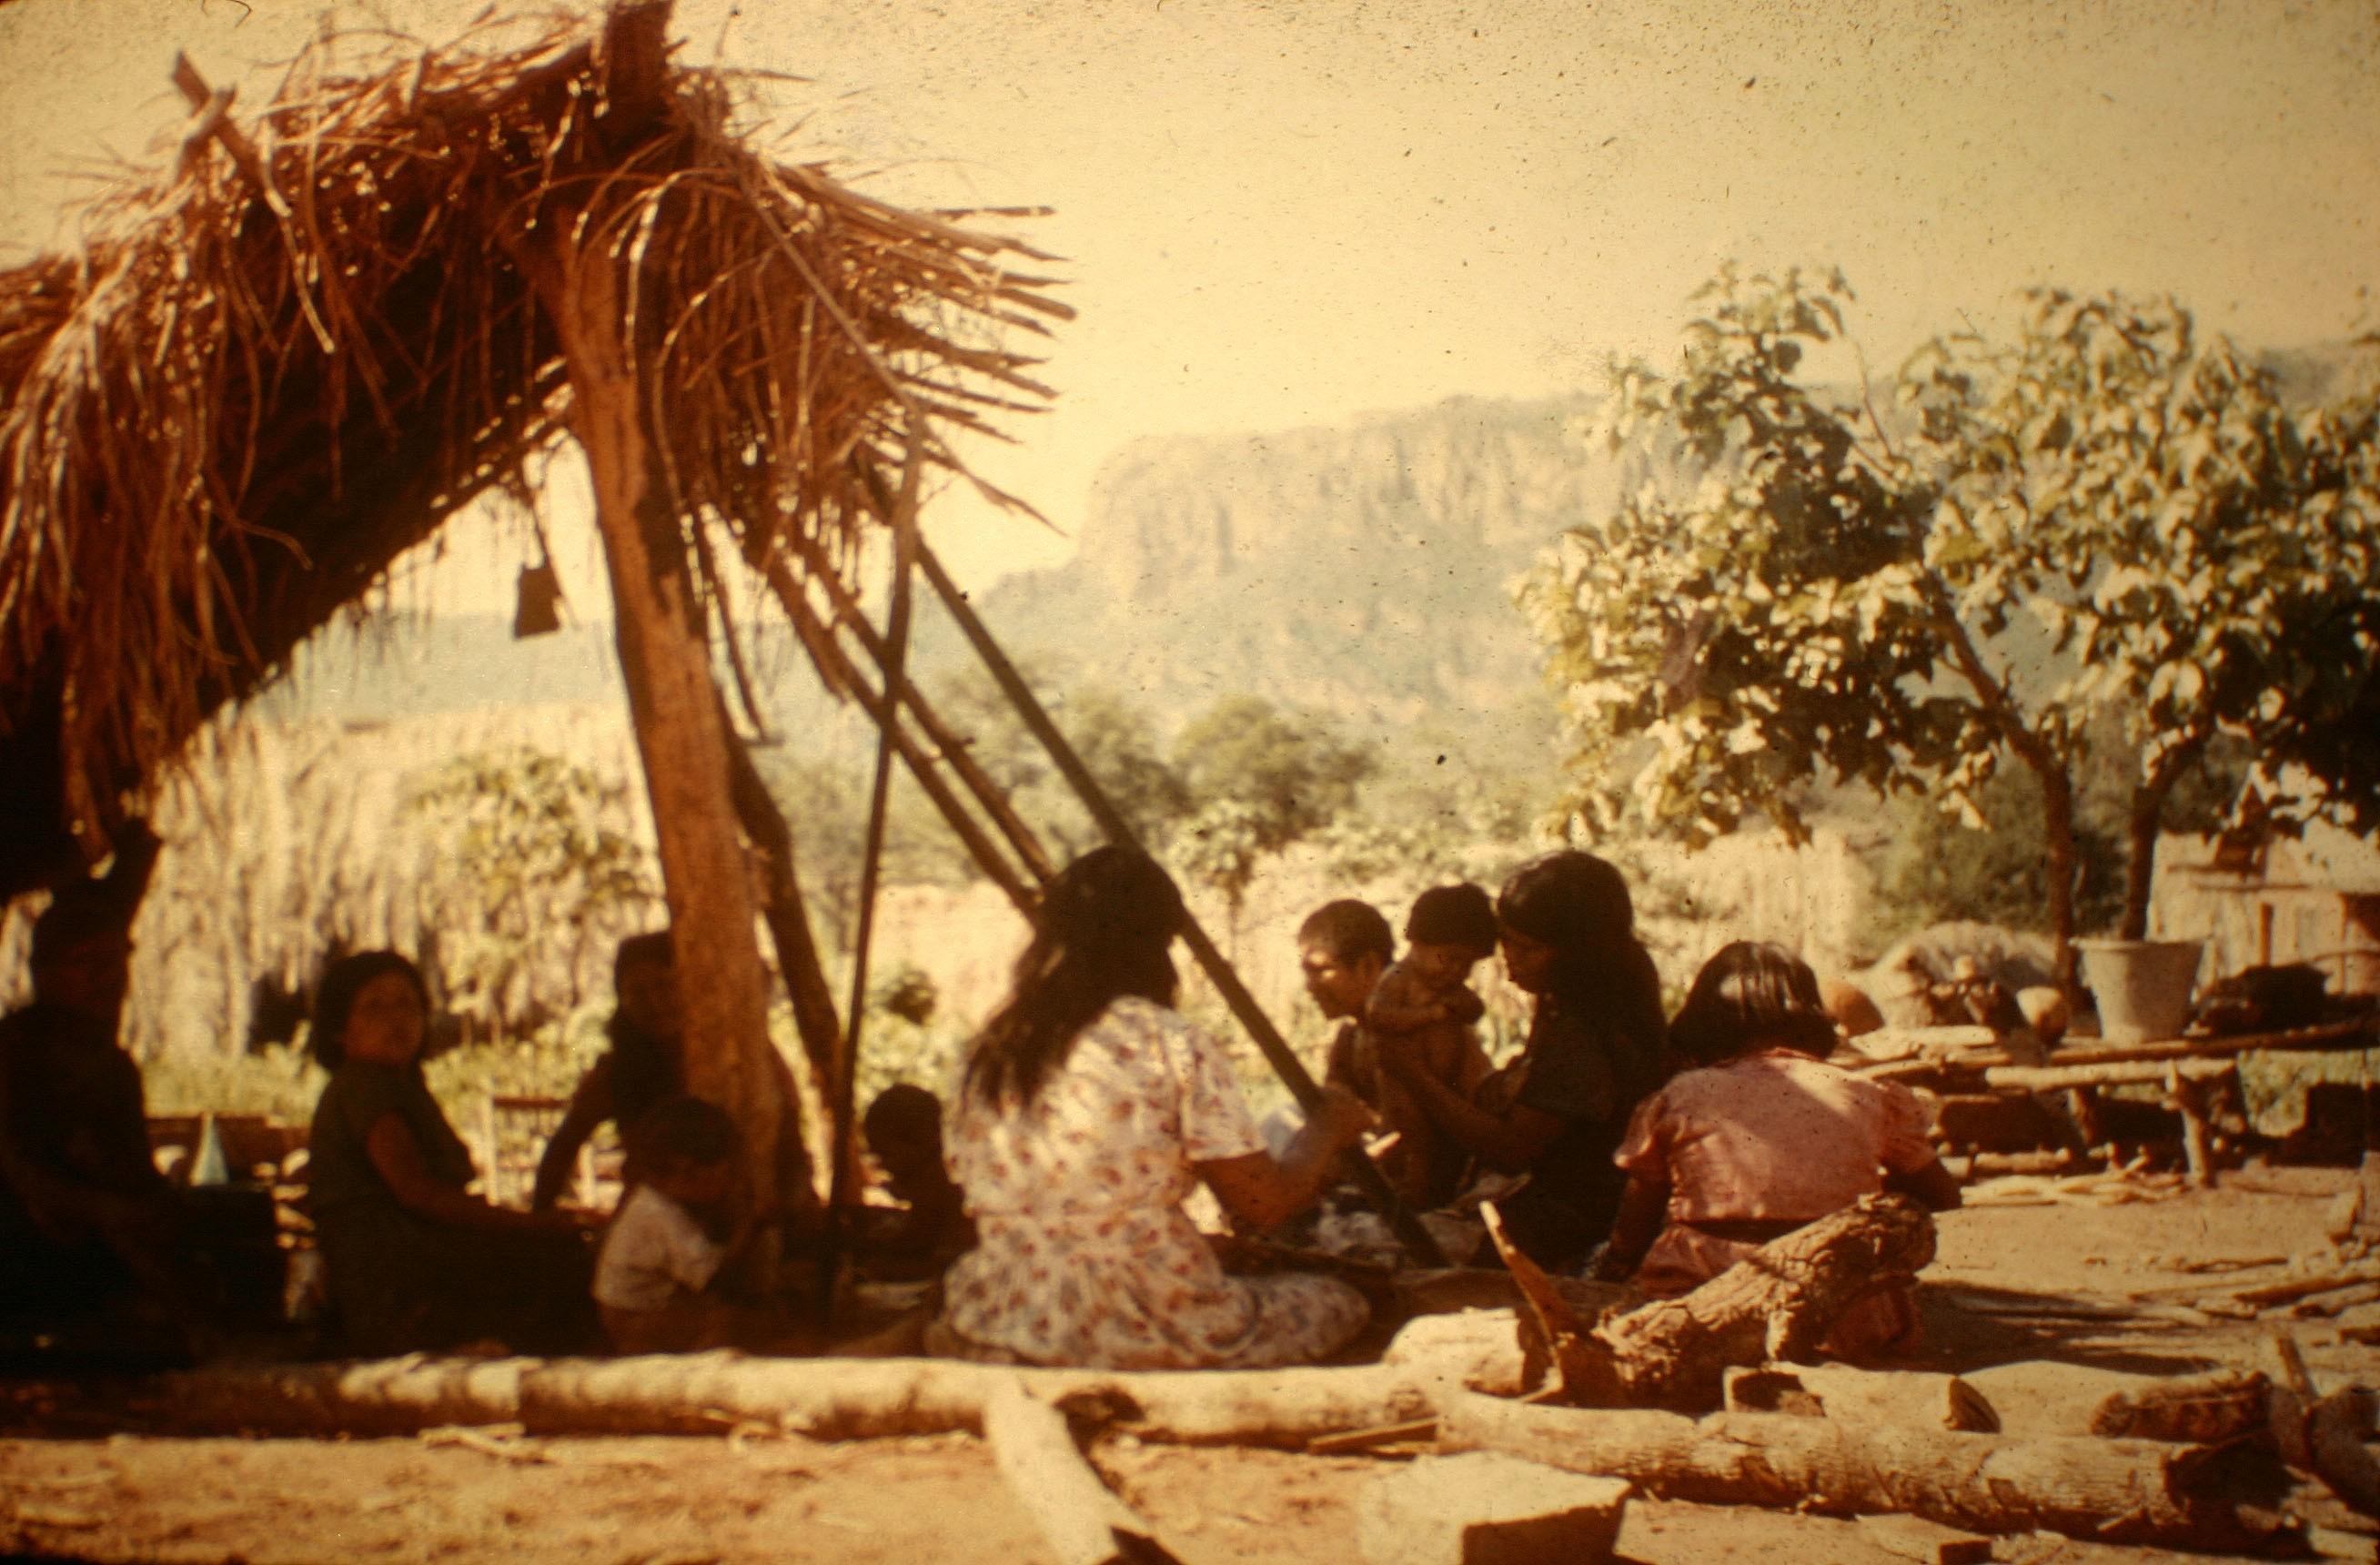 Ayore ladies in lean-to weaving and visiting.